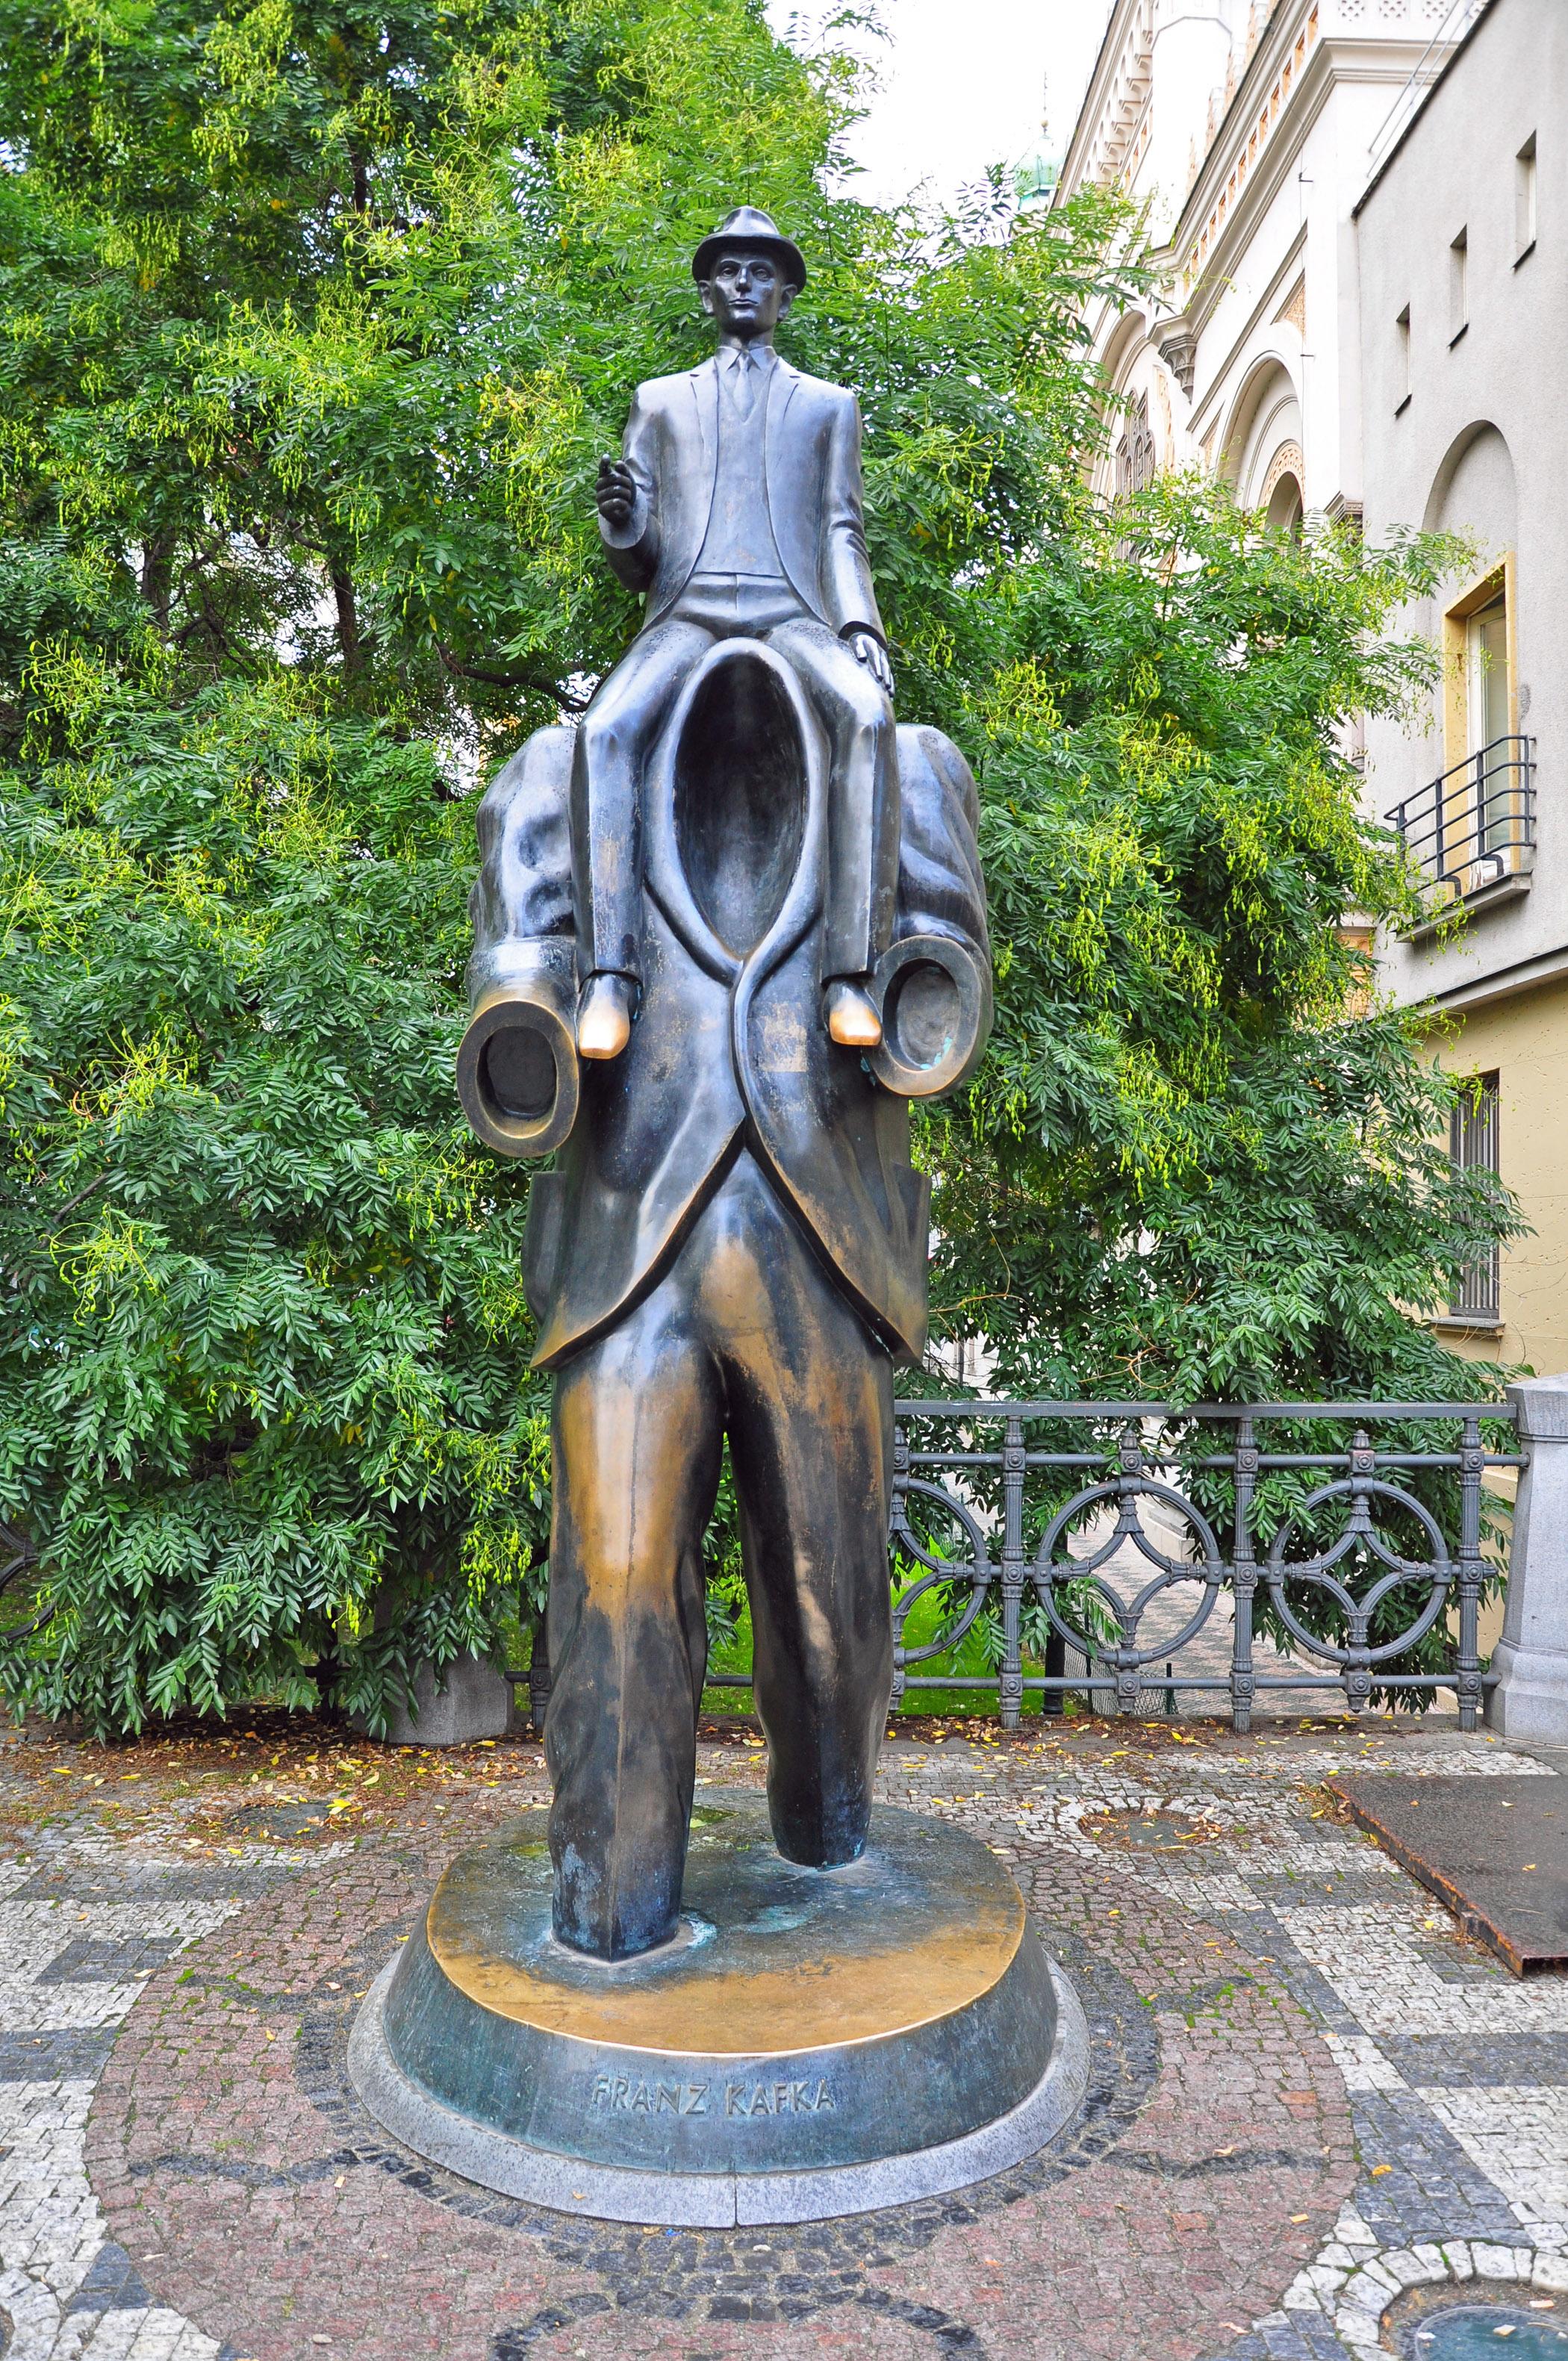 4. Kafka monument